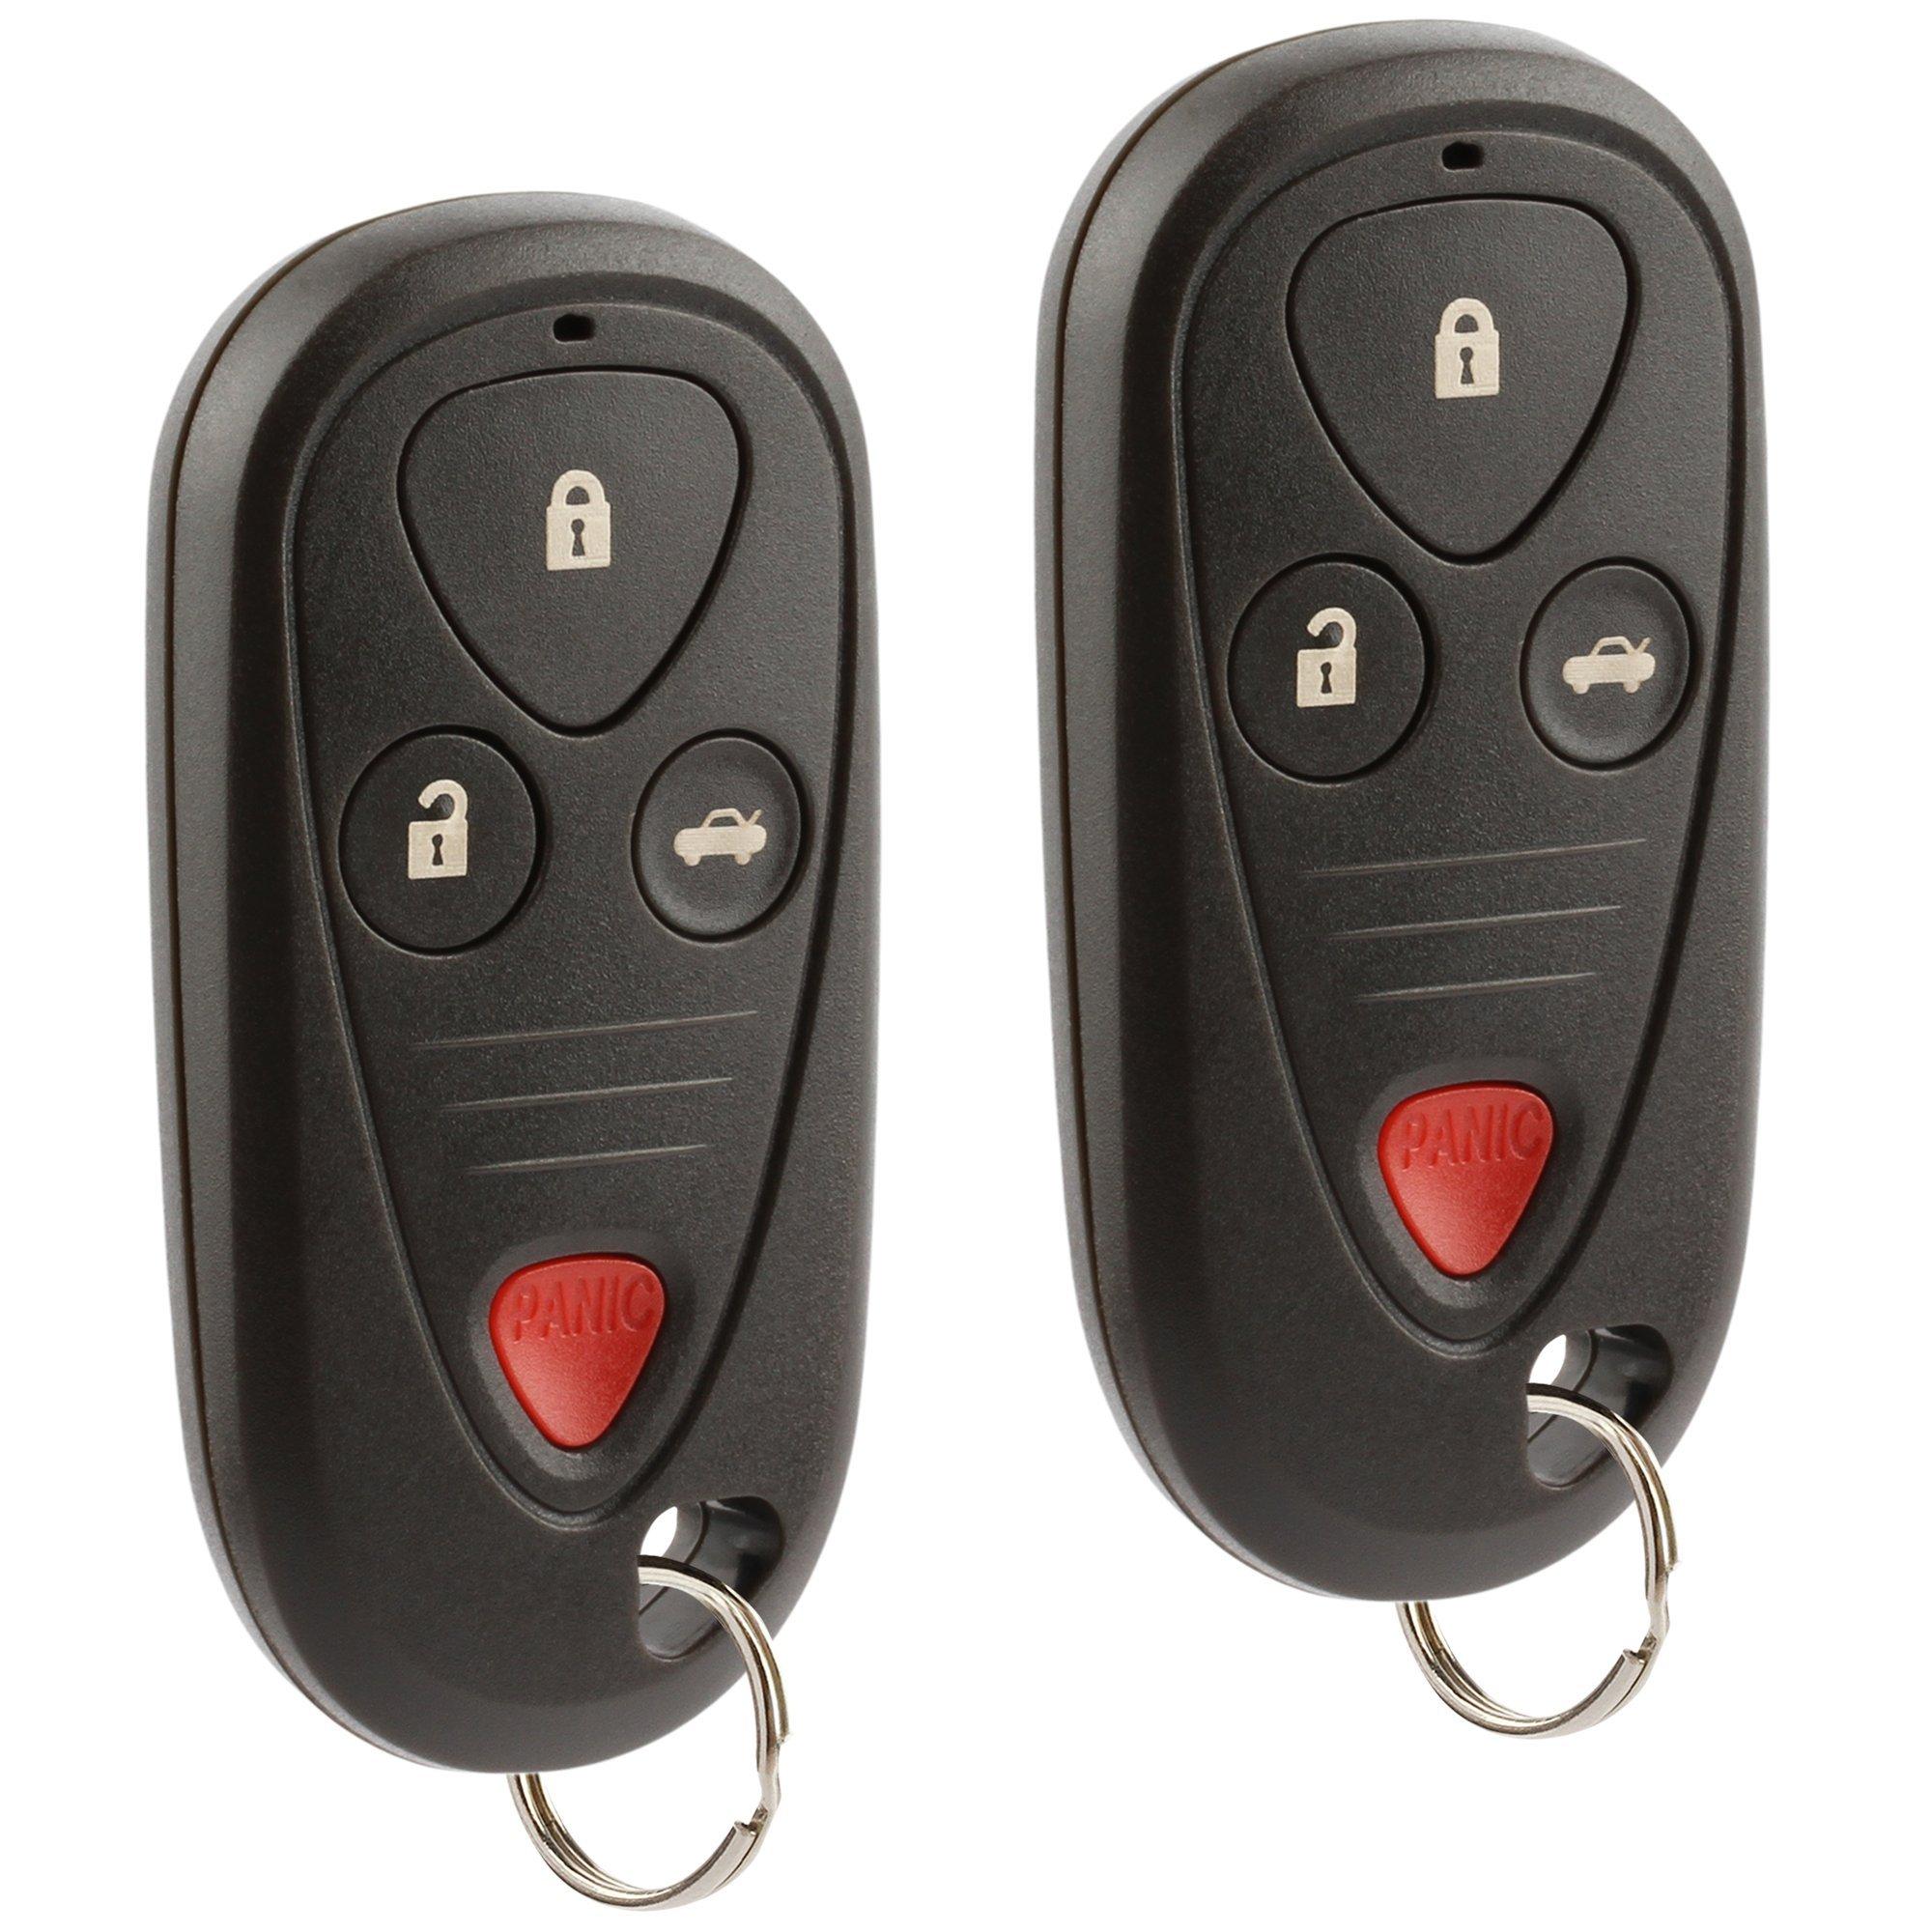 Car Key Fob Keyless Entry Remote fits 2001-2003 Acura CL / 2002-2004 Acura RL / 2002-2003 Acura TL (E4EG8D-444H-A, G8D-444H-A), Set of 2